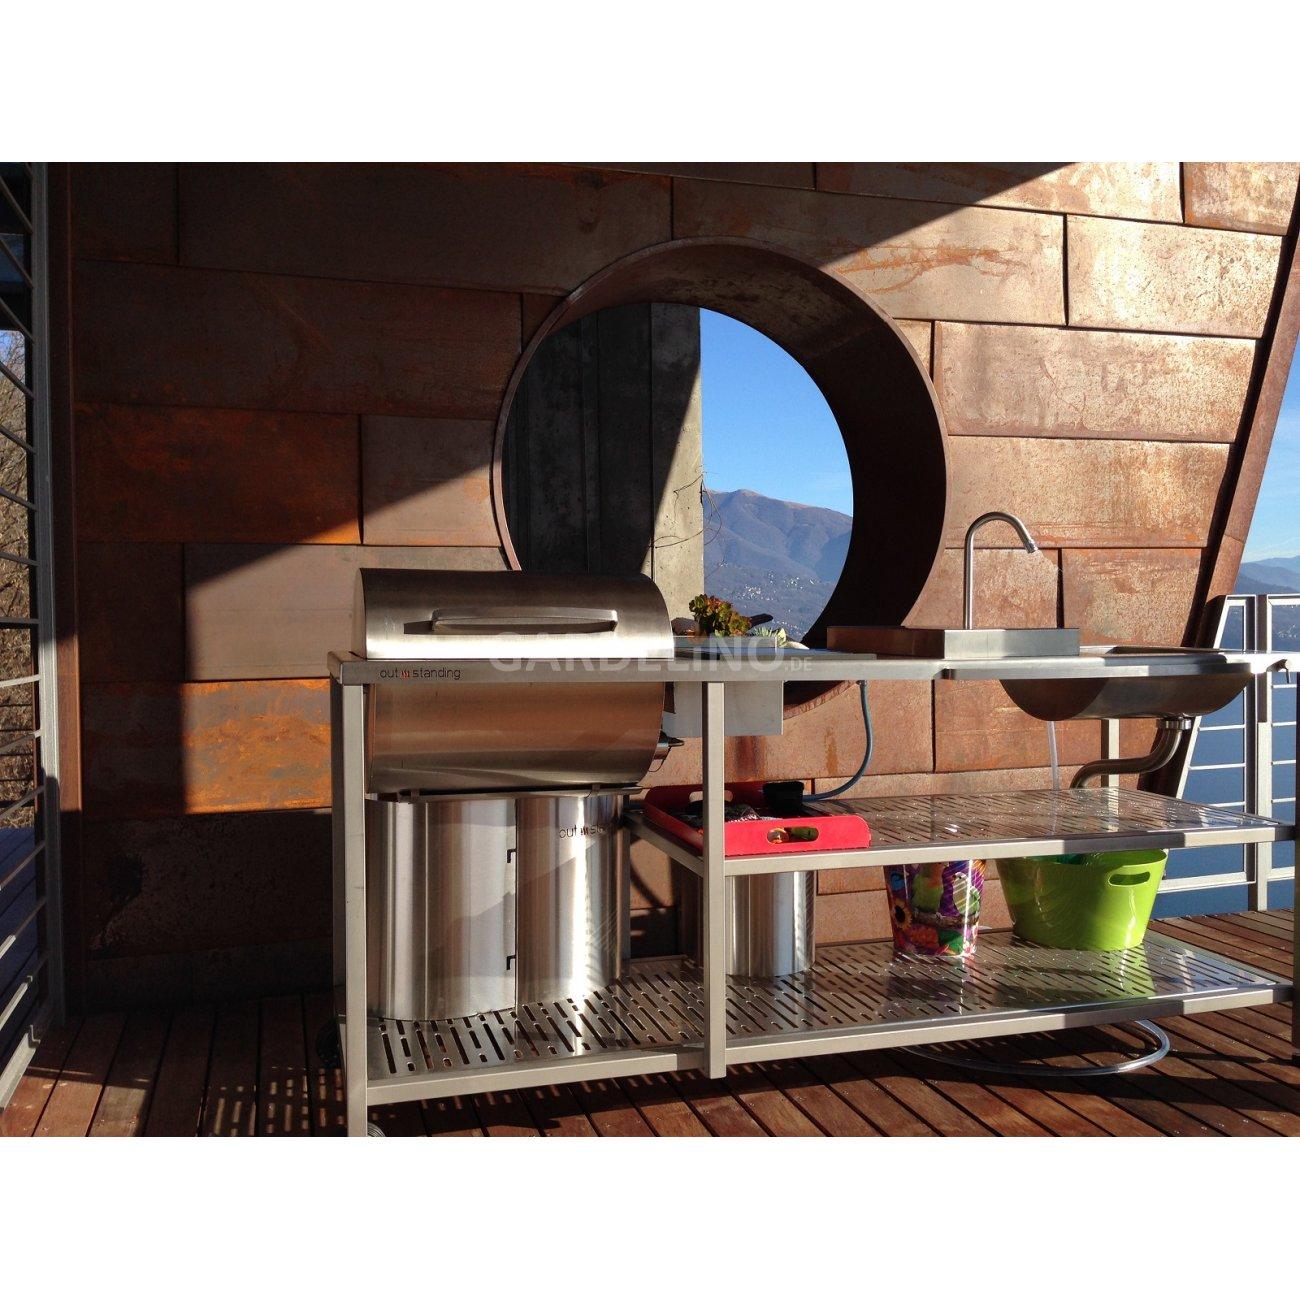 outstanding gartenküche vor wunderschönem panorama